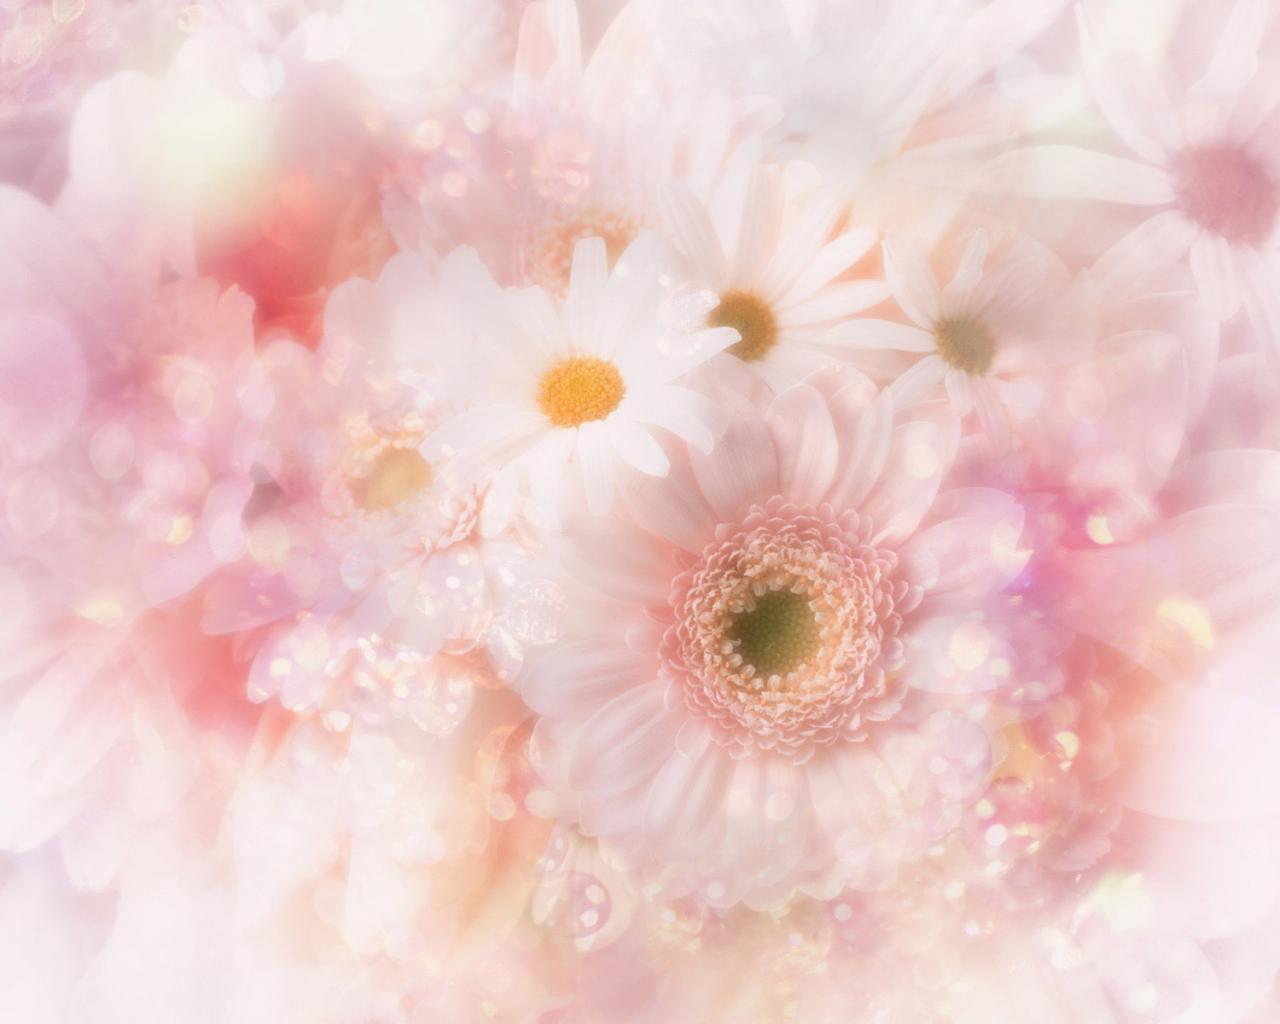 hq-wallpapers_ru_flowers_37627_1280x1024